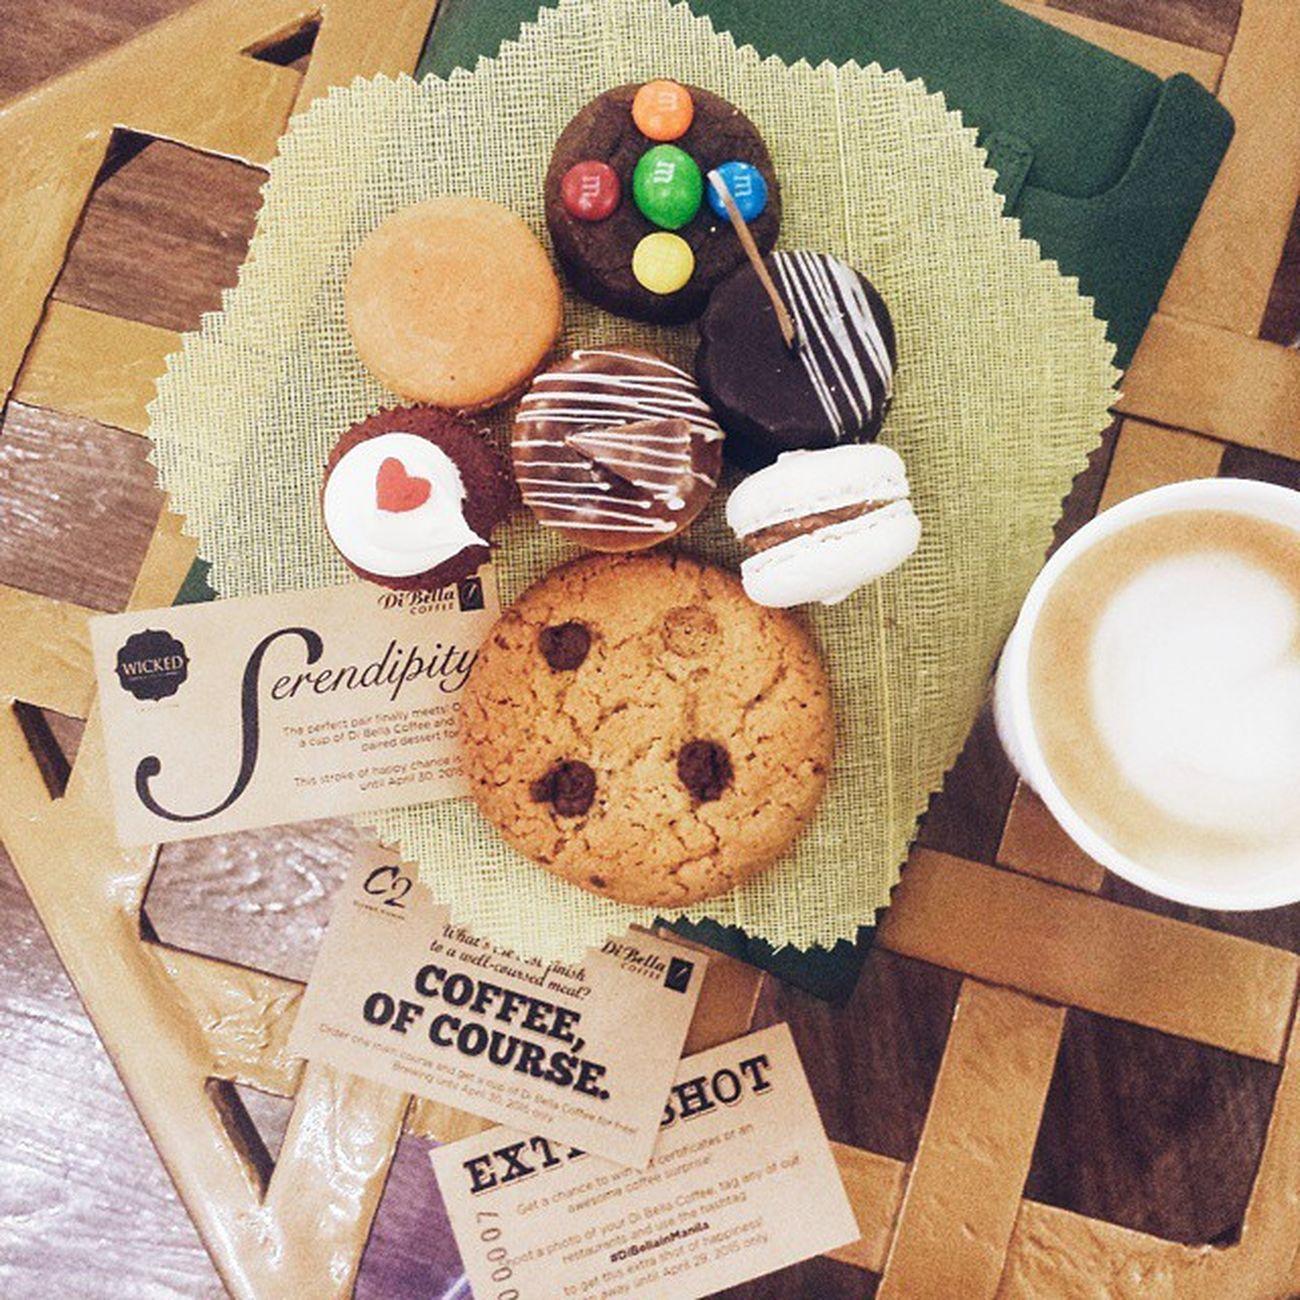 Happening now, Coffee Tea & All That Jazz @shangrilaplazaofficial East Atrium. Coffeeteajazzattheshang DiBellainManila